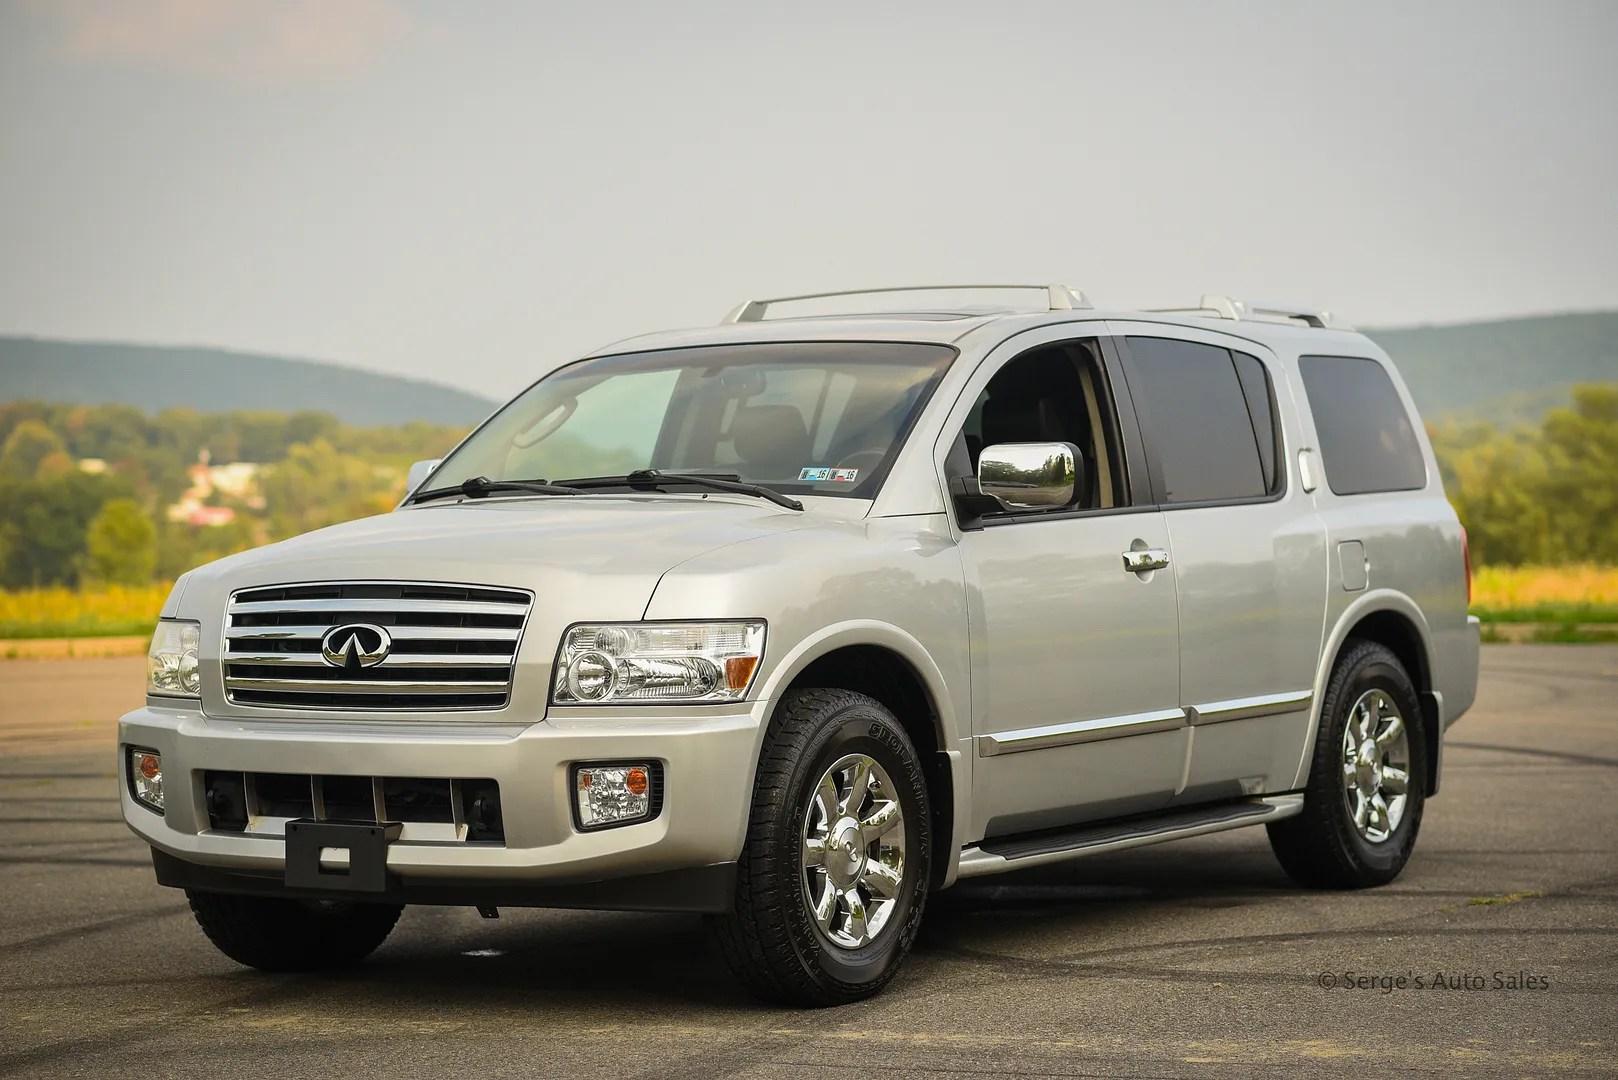 photo Infiniti-Serges-Auto-Sales-Car-dealer-Pennsylvania-QX56-Scranton-Nepa-16_zps5tb8e6mq.jpg